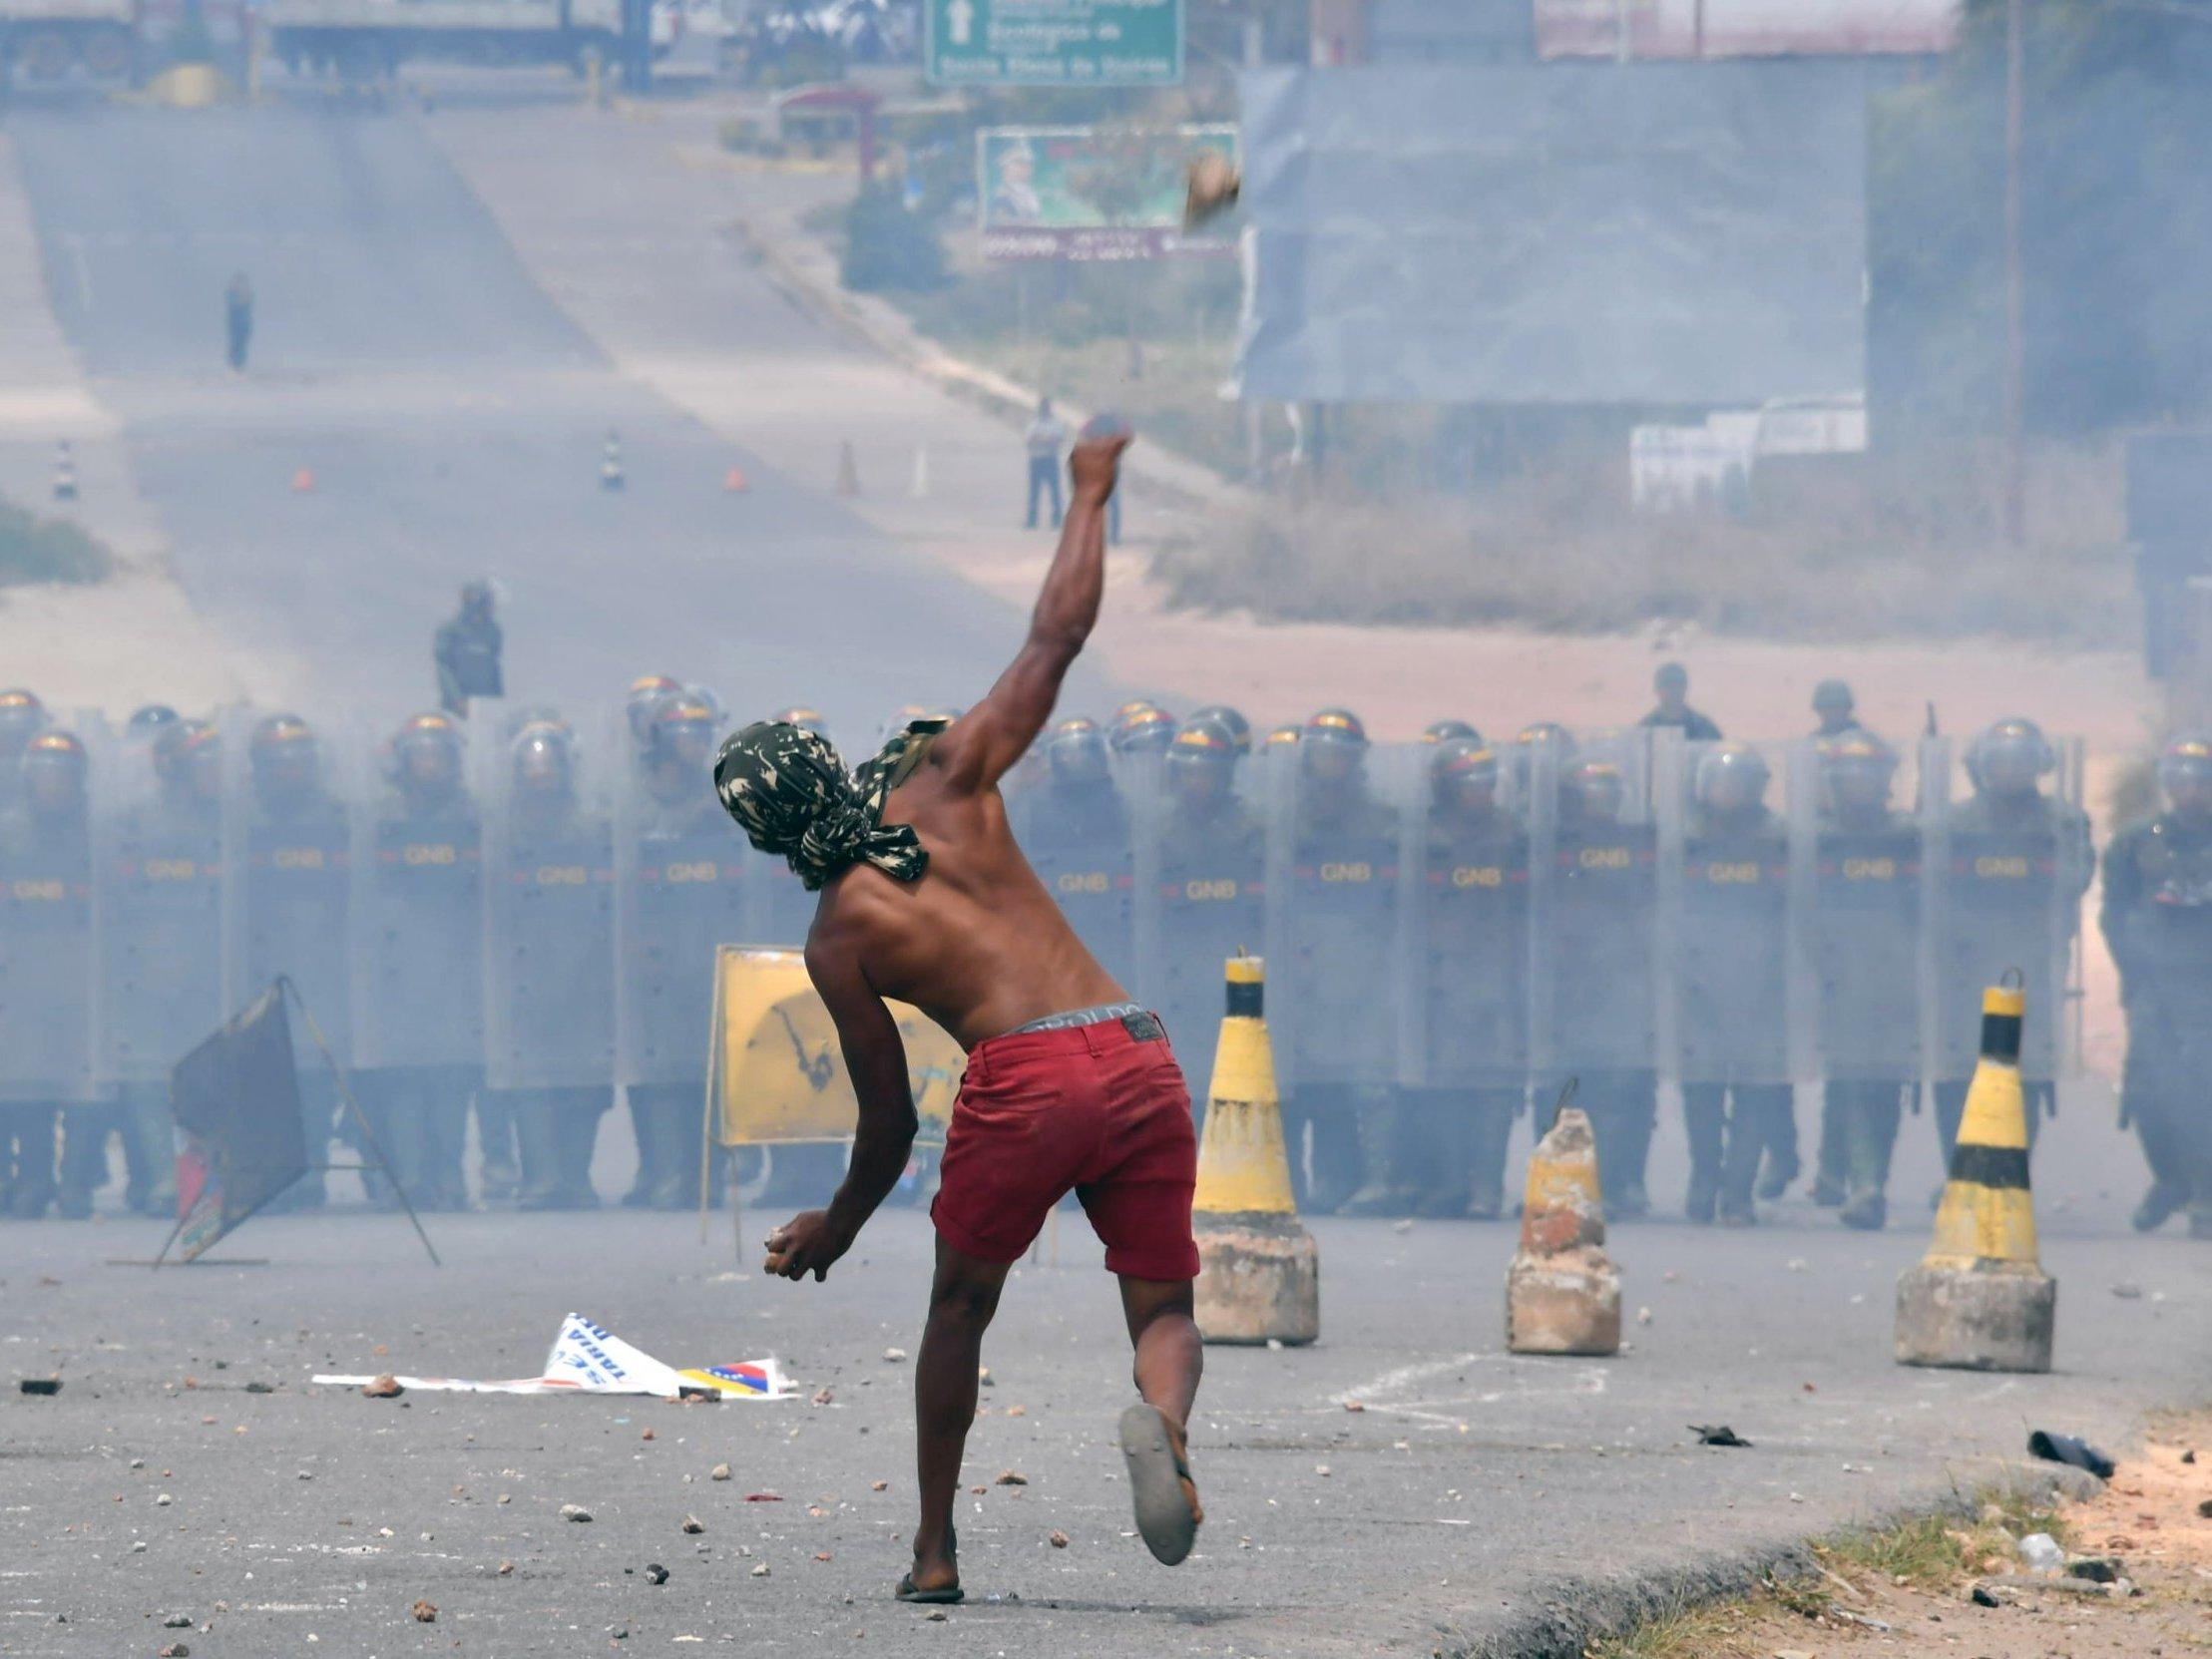 venezuela-protest-sunday.jpg